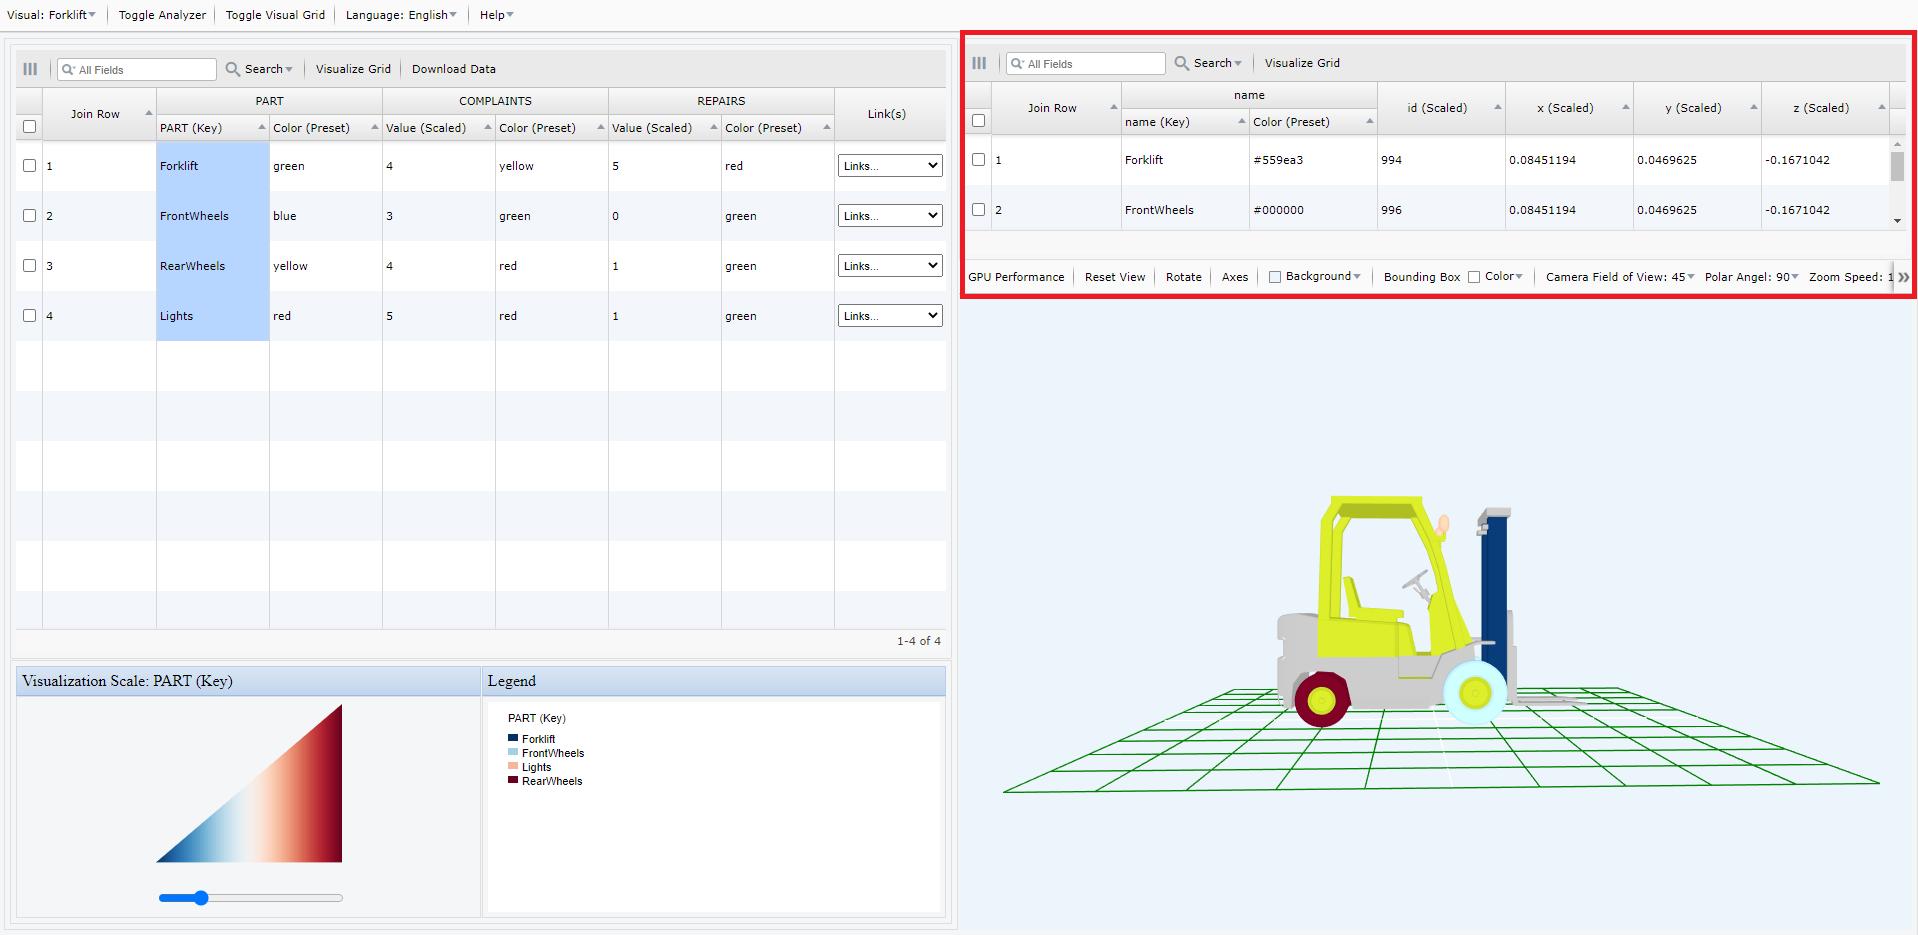 Screen Shot of My Data Visualizer ForkLift4